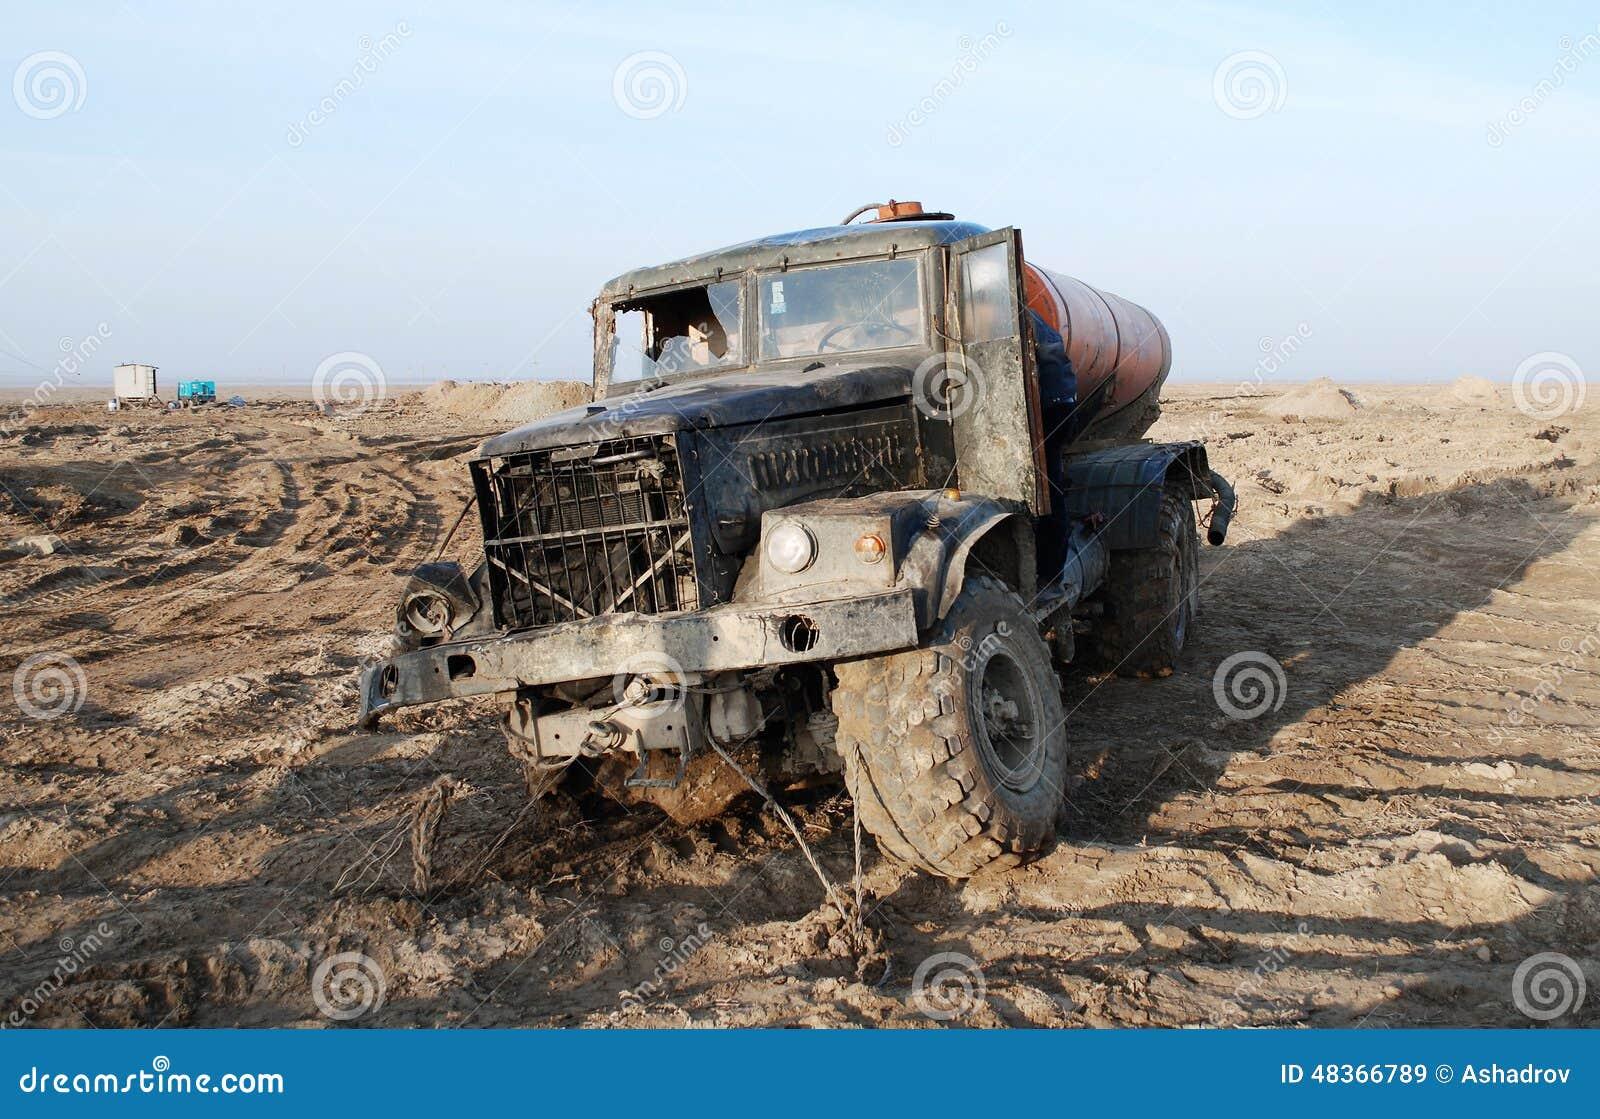 destroyed-military-truck-desert-old-army-abandoned-48366789.jpg